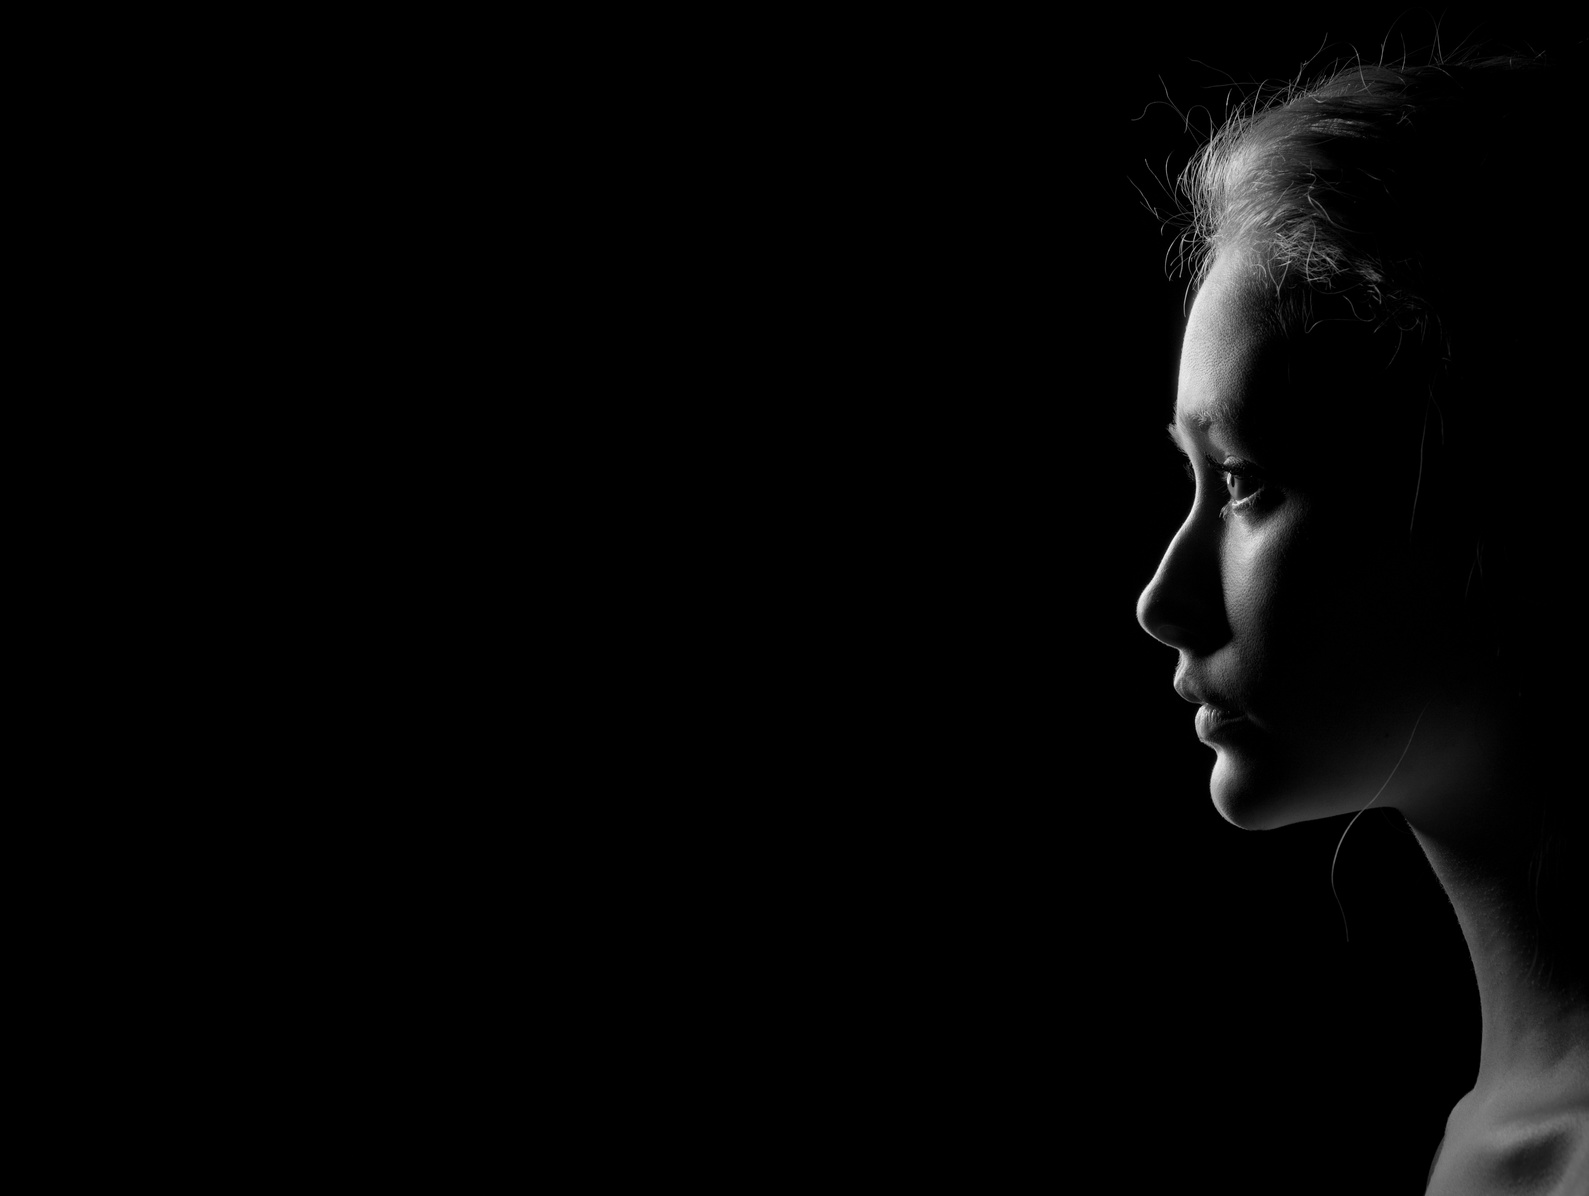 5 Reasons Why Women Don't Speak Up